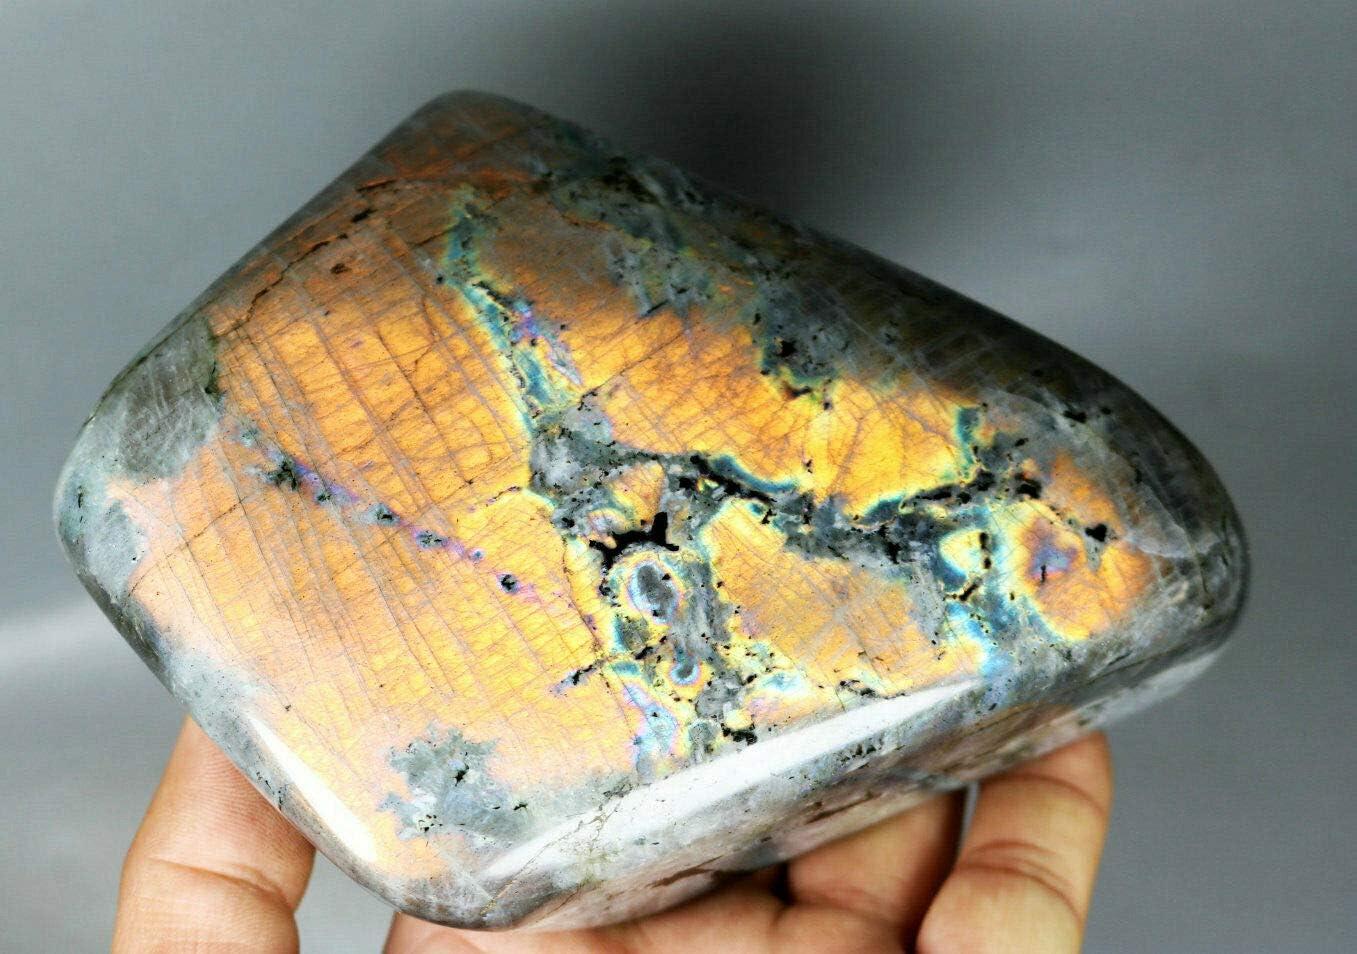 2.49lb Polished Rainbow Flash Spectrolite Palm Cryst Very popular Labradorite Year-end annual account